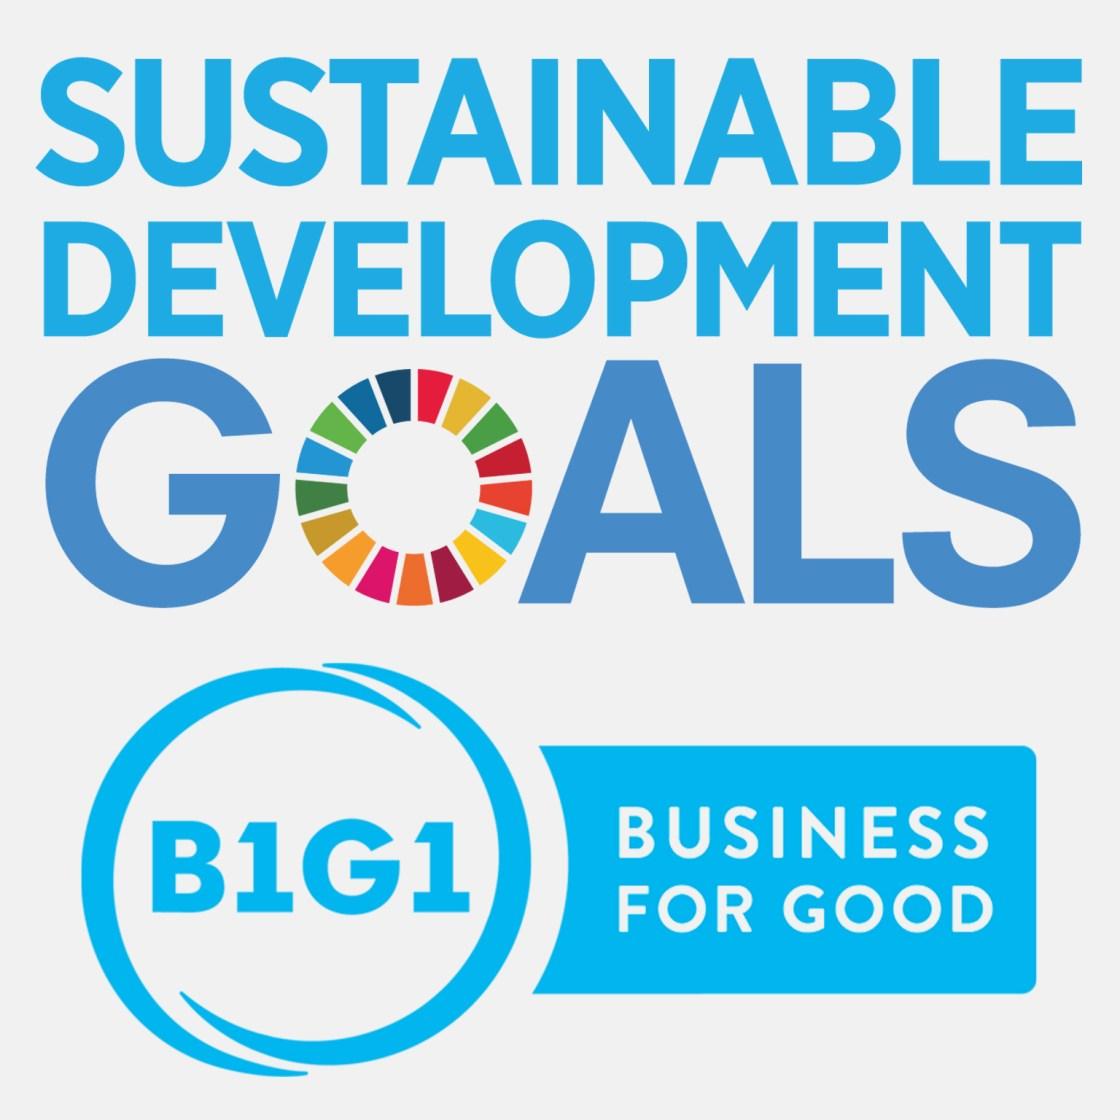 B1G1 SDG Sustainable